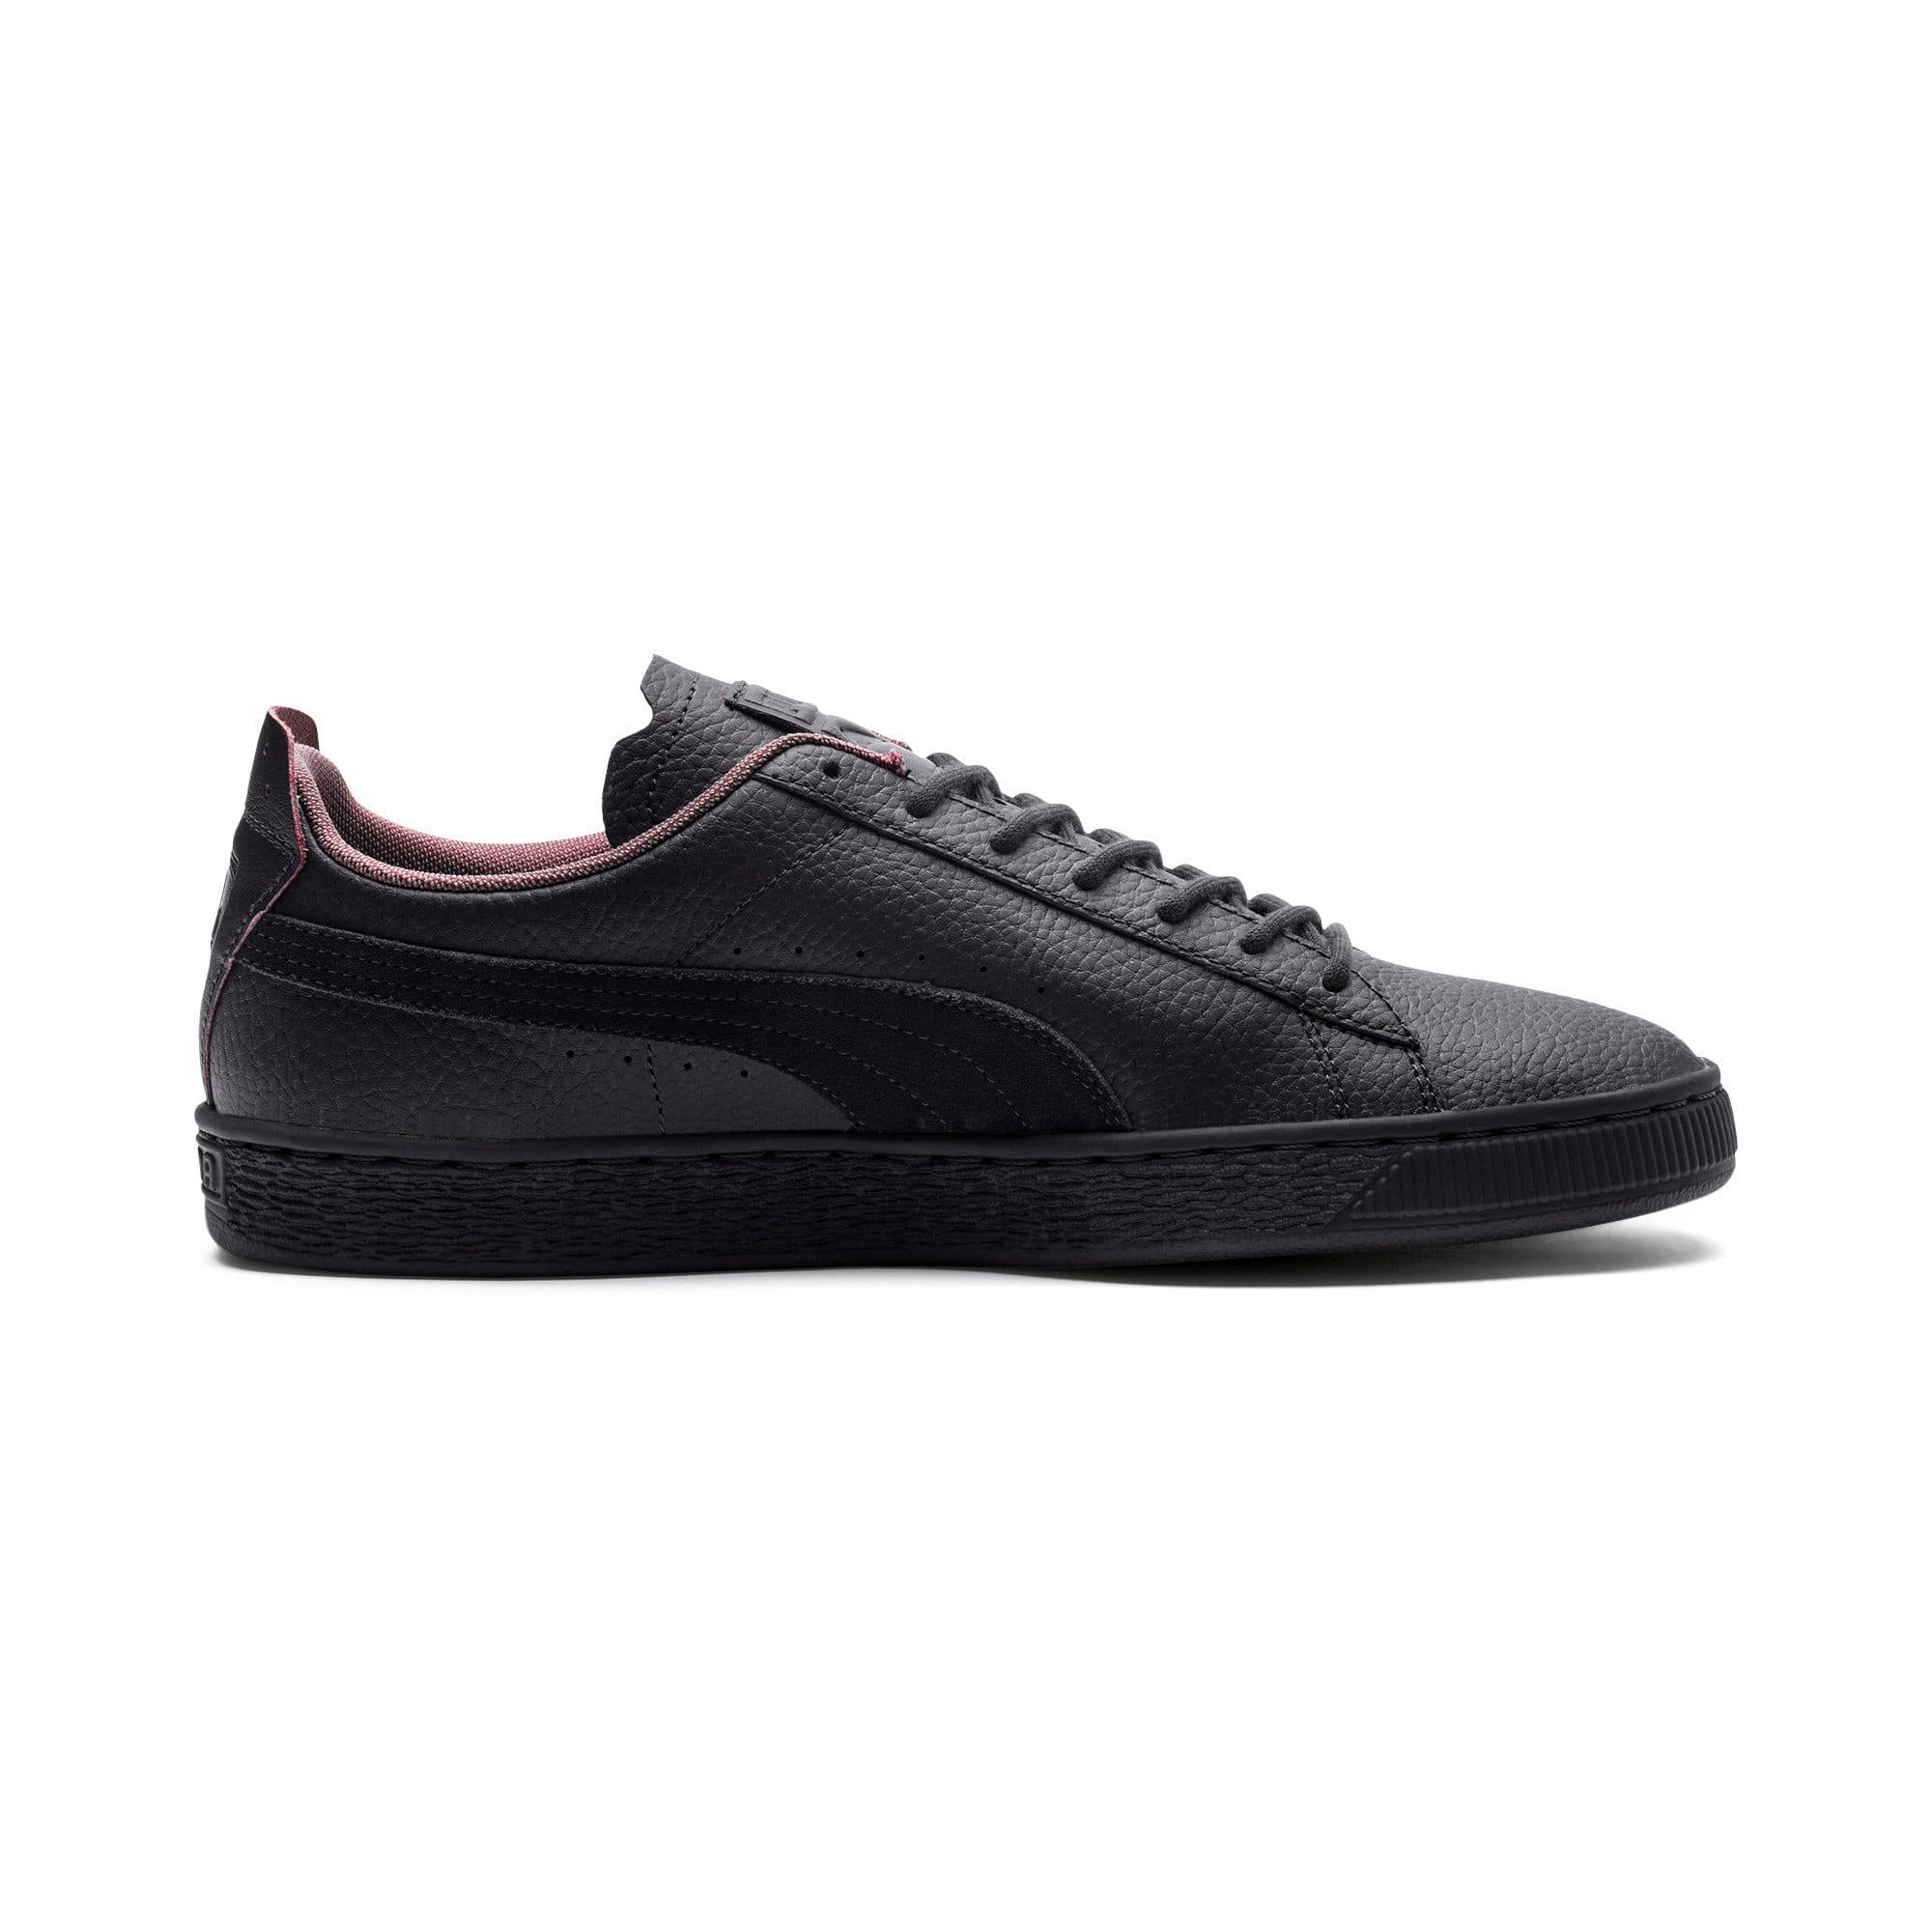 Thumbnail 5 of Scuderia Ferrari Basket Sneakers, MoonlessNight-MoonlessNight, medium